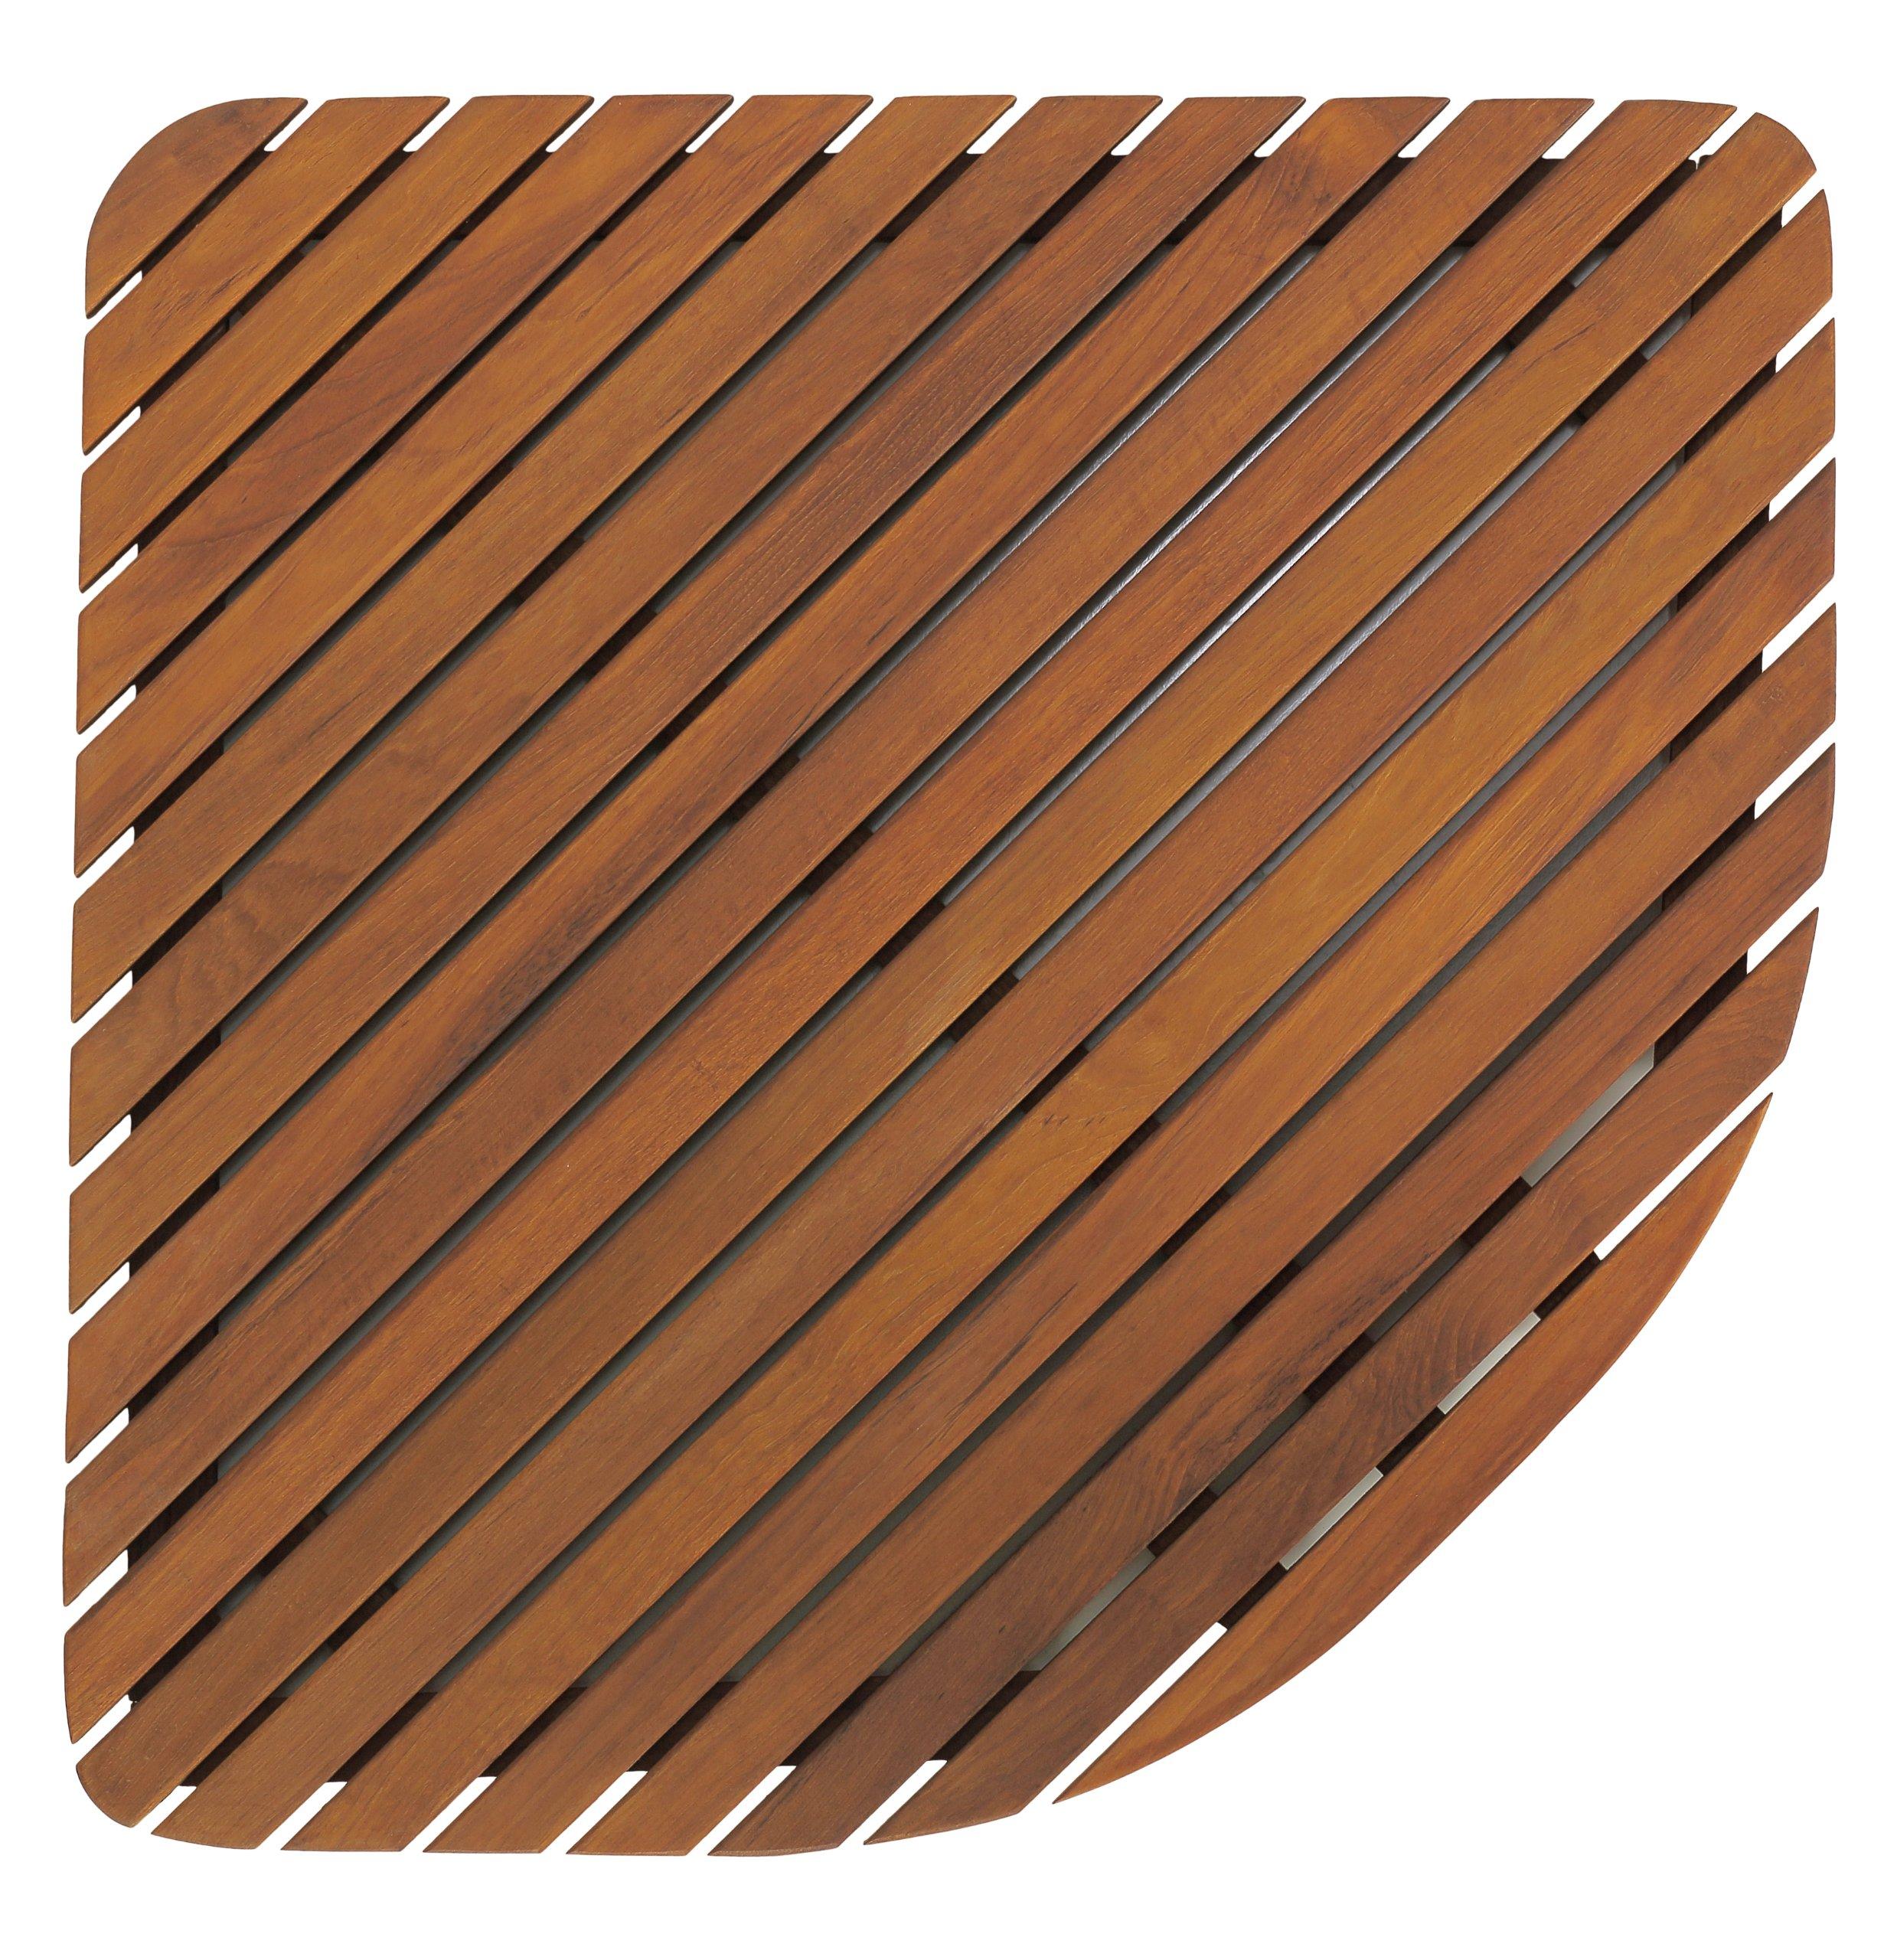 RussianBear Canadian oak Venik Broom for Russian Sauna Banya Bath House Natural Wood